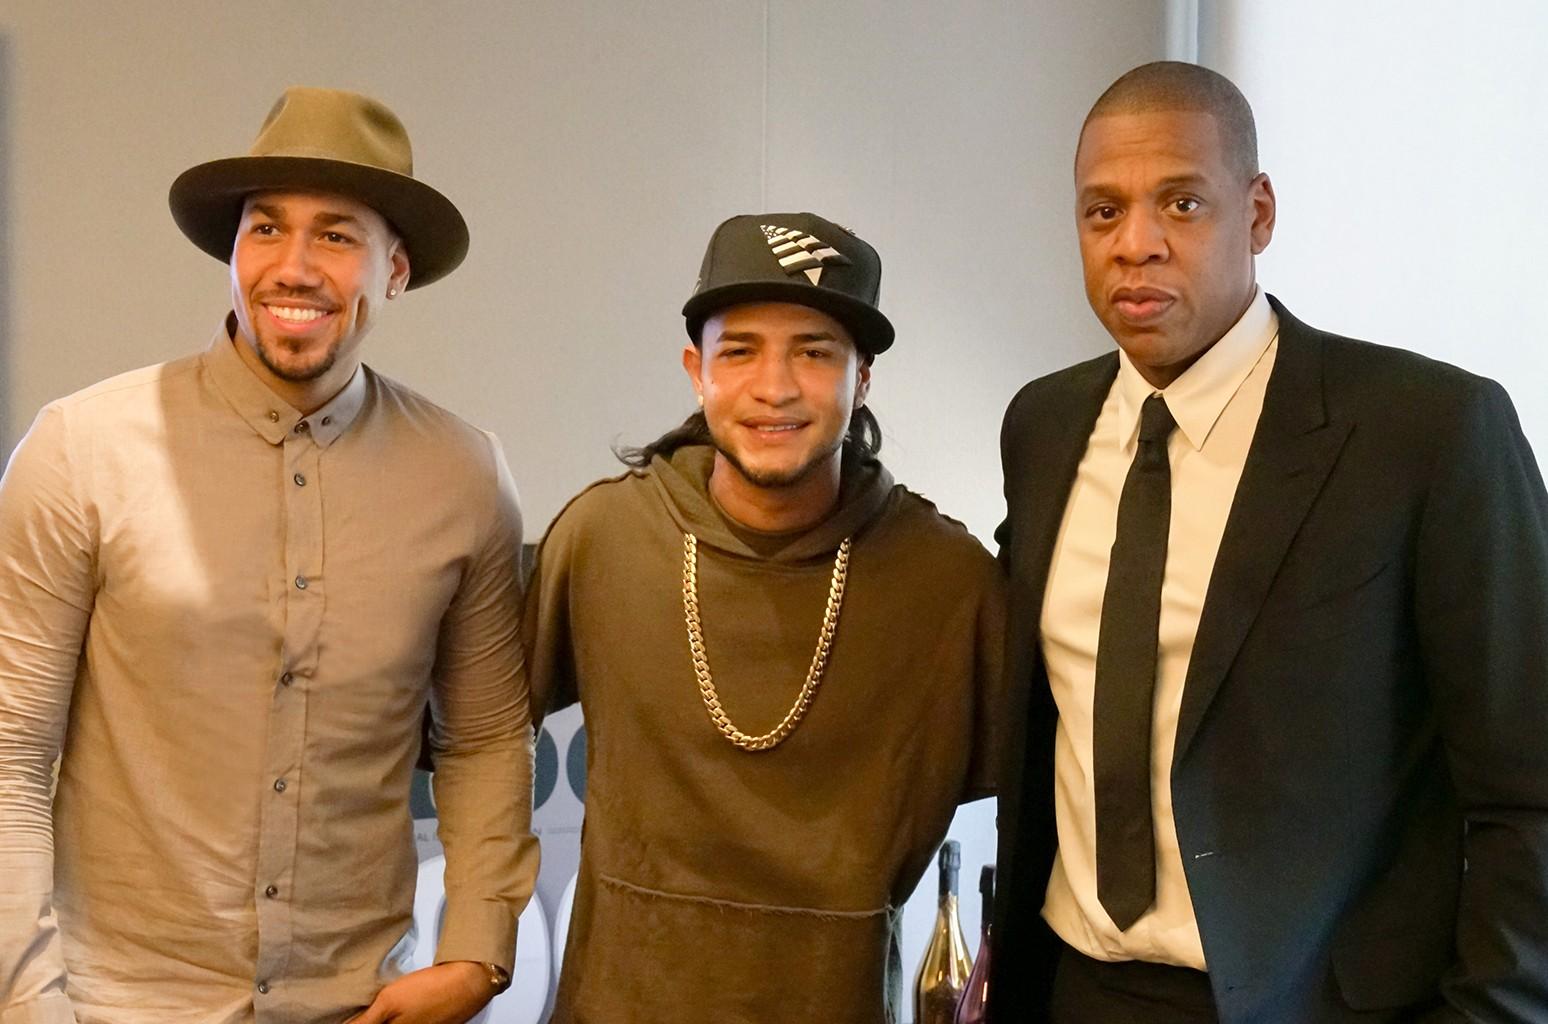 Romeo Santos, Mozart La Para and Jay Z